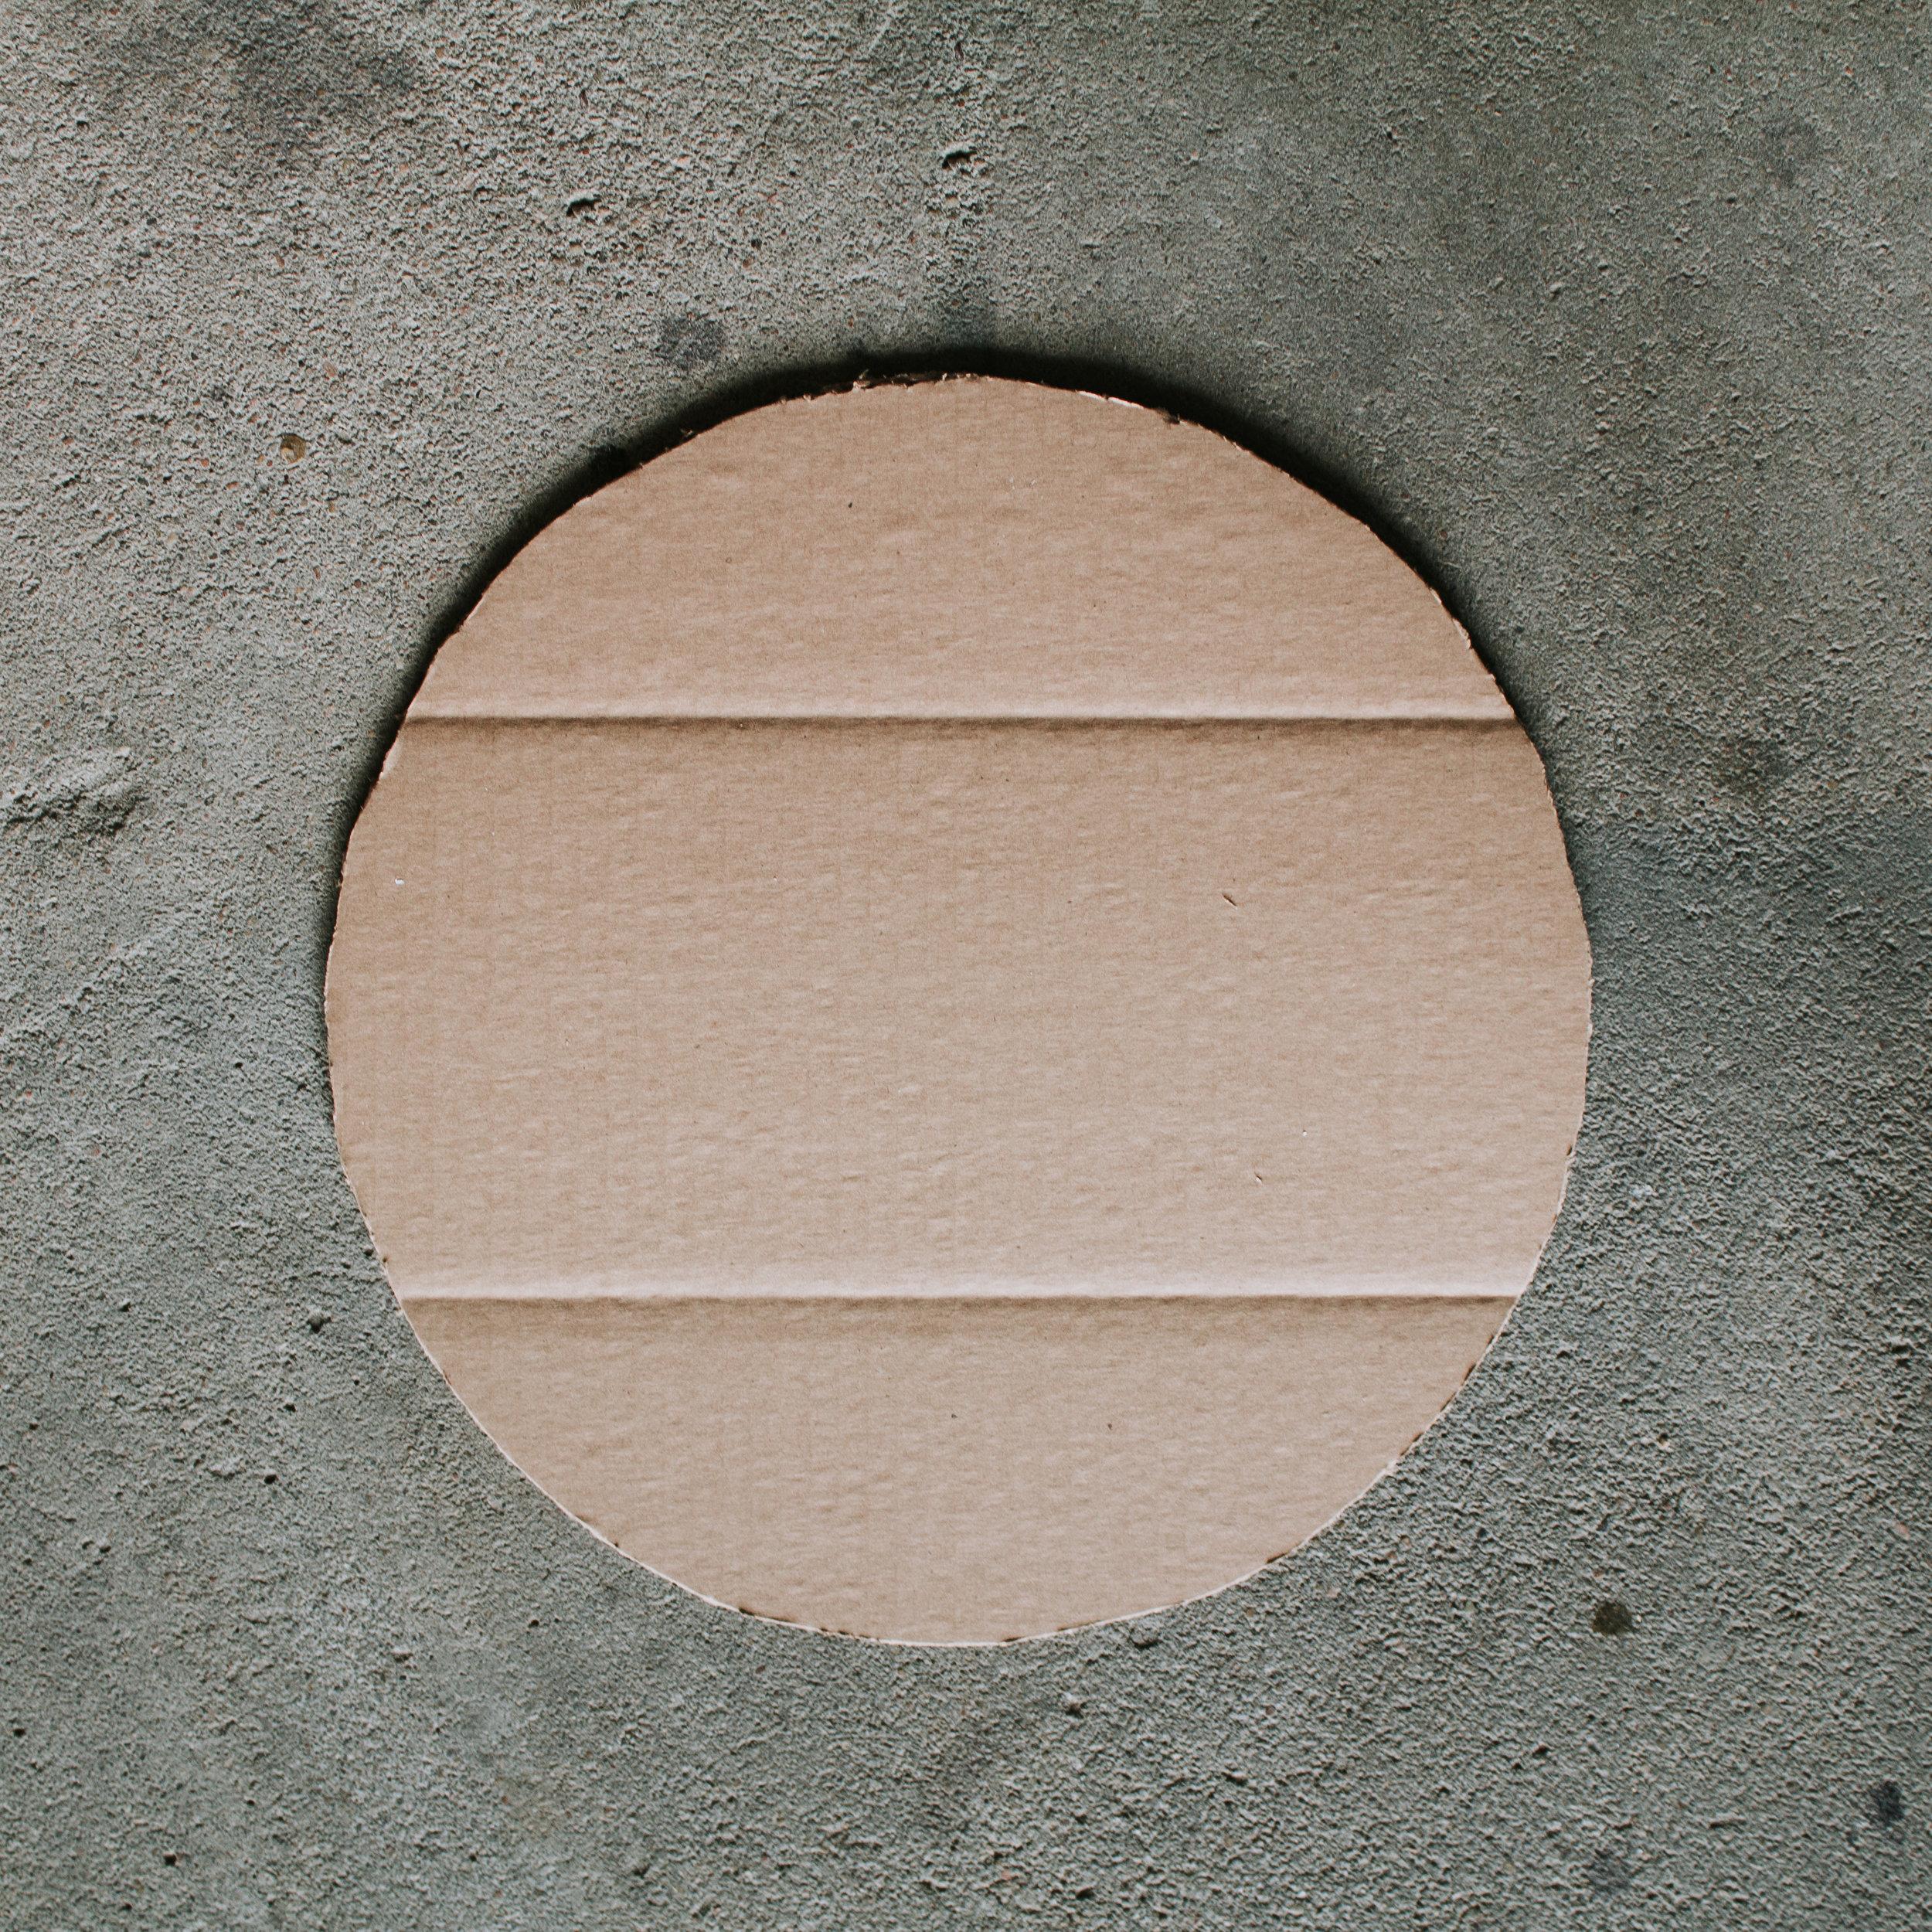 Cut out a circle